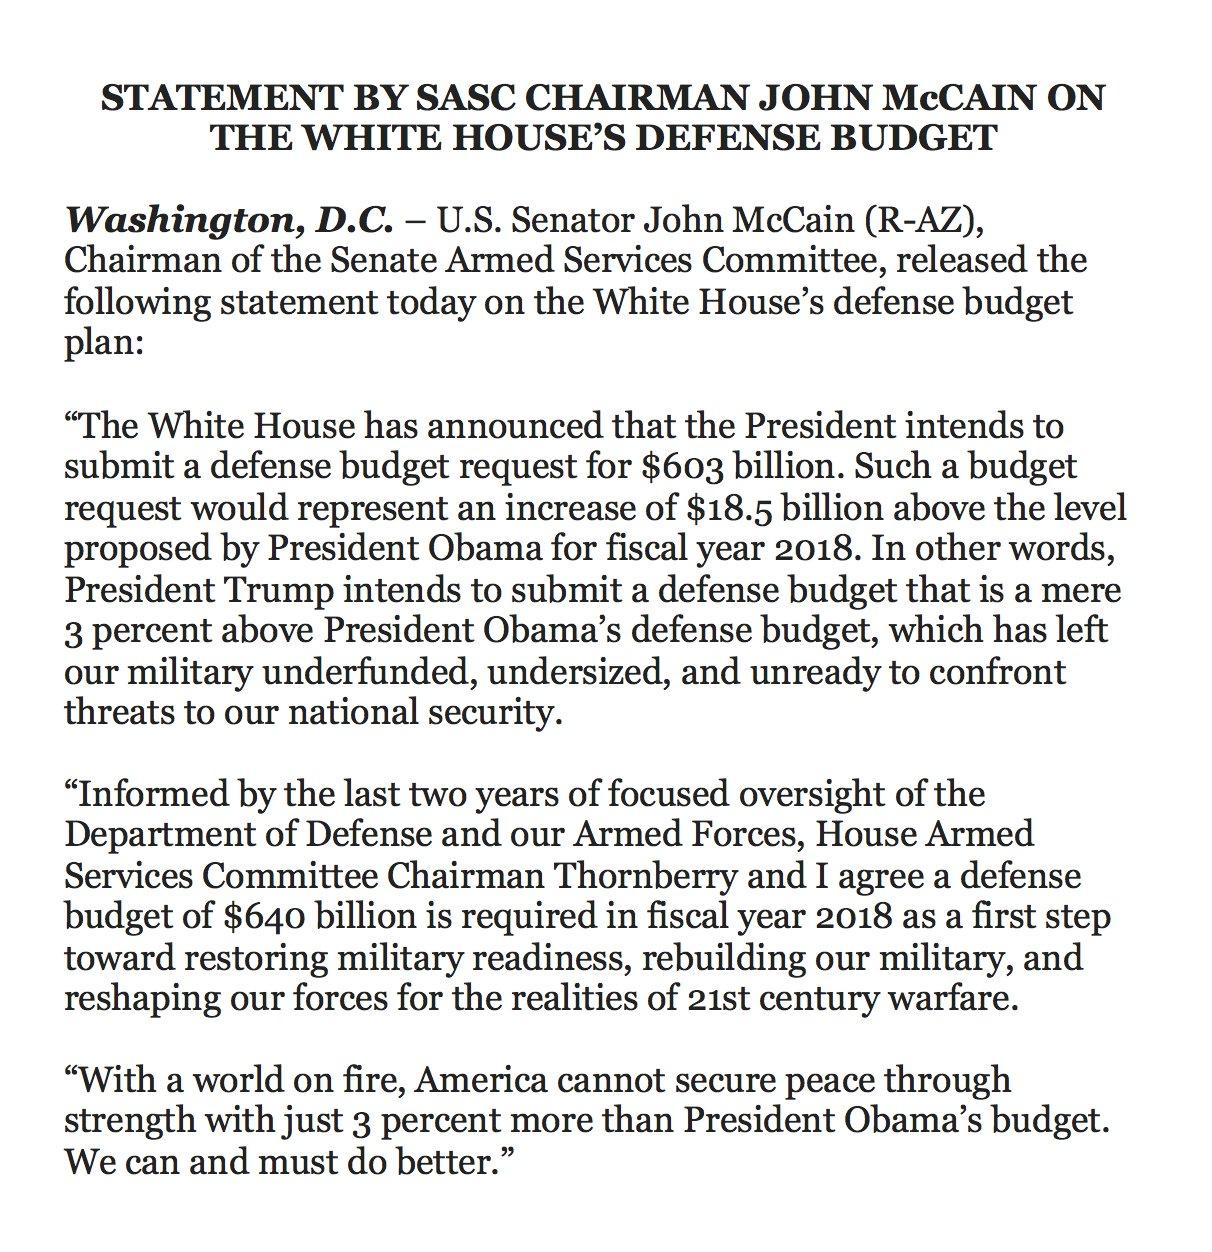 @DavidShepardson: RT @BraddJaffy: John McCain says there's not enough defense money in Trump's budget https://t.co/bi5jqLcZuh